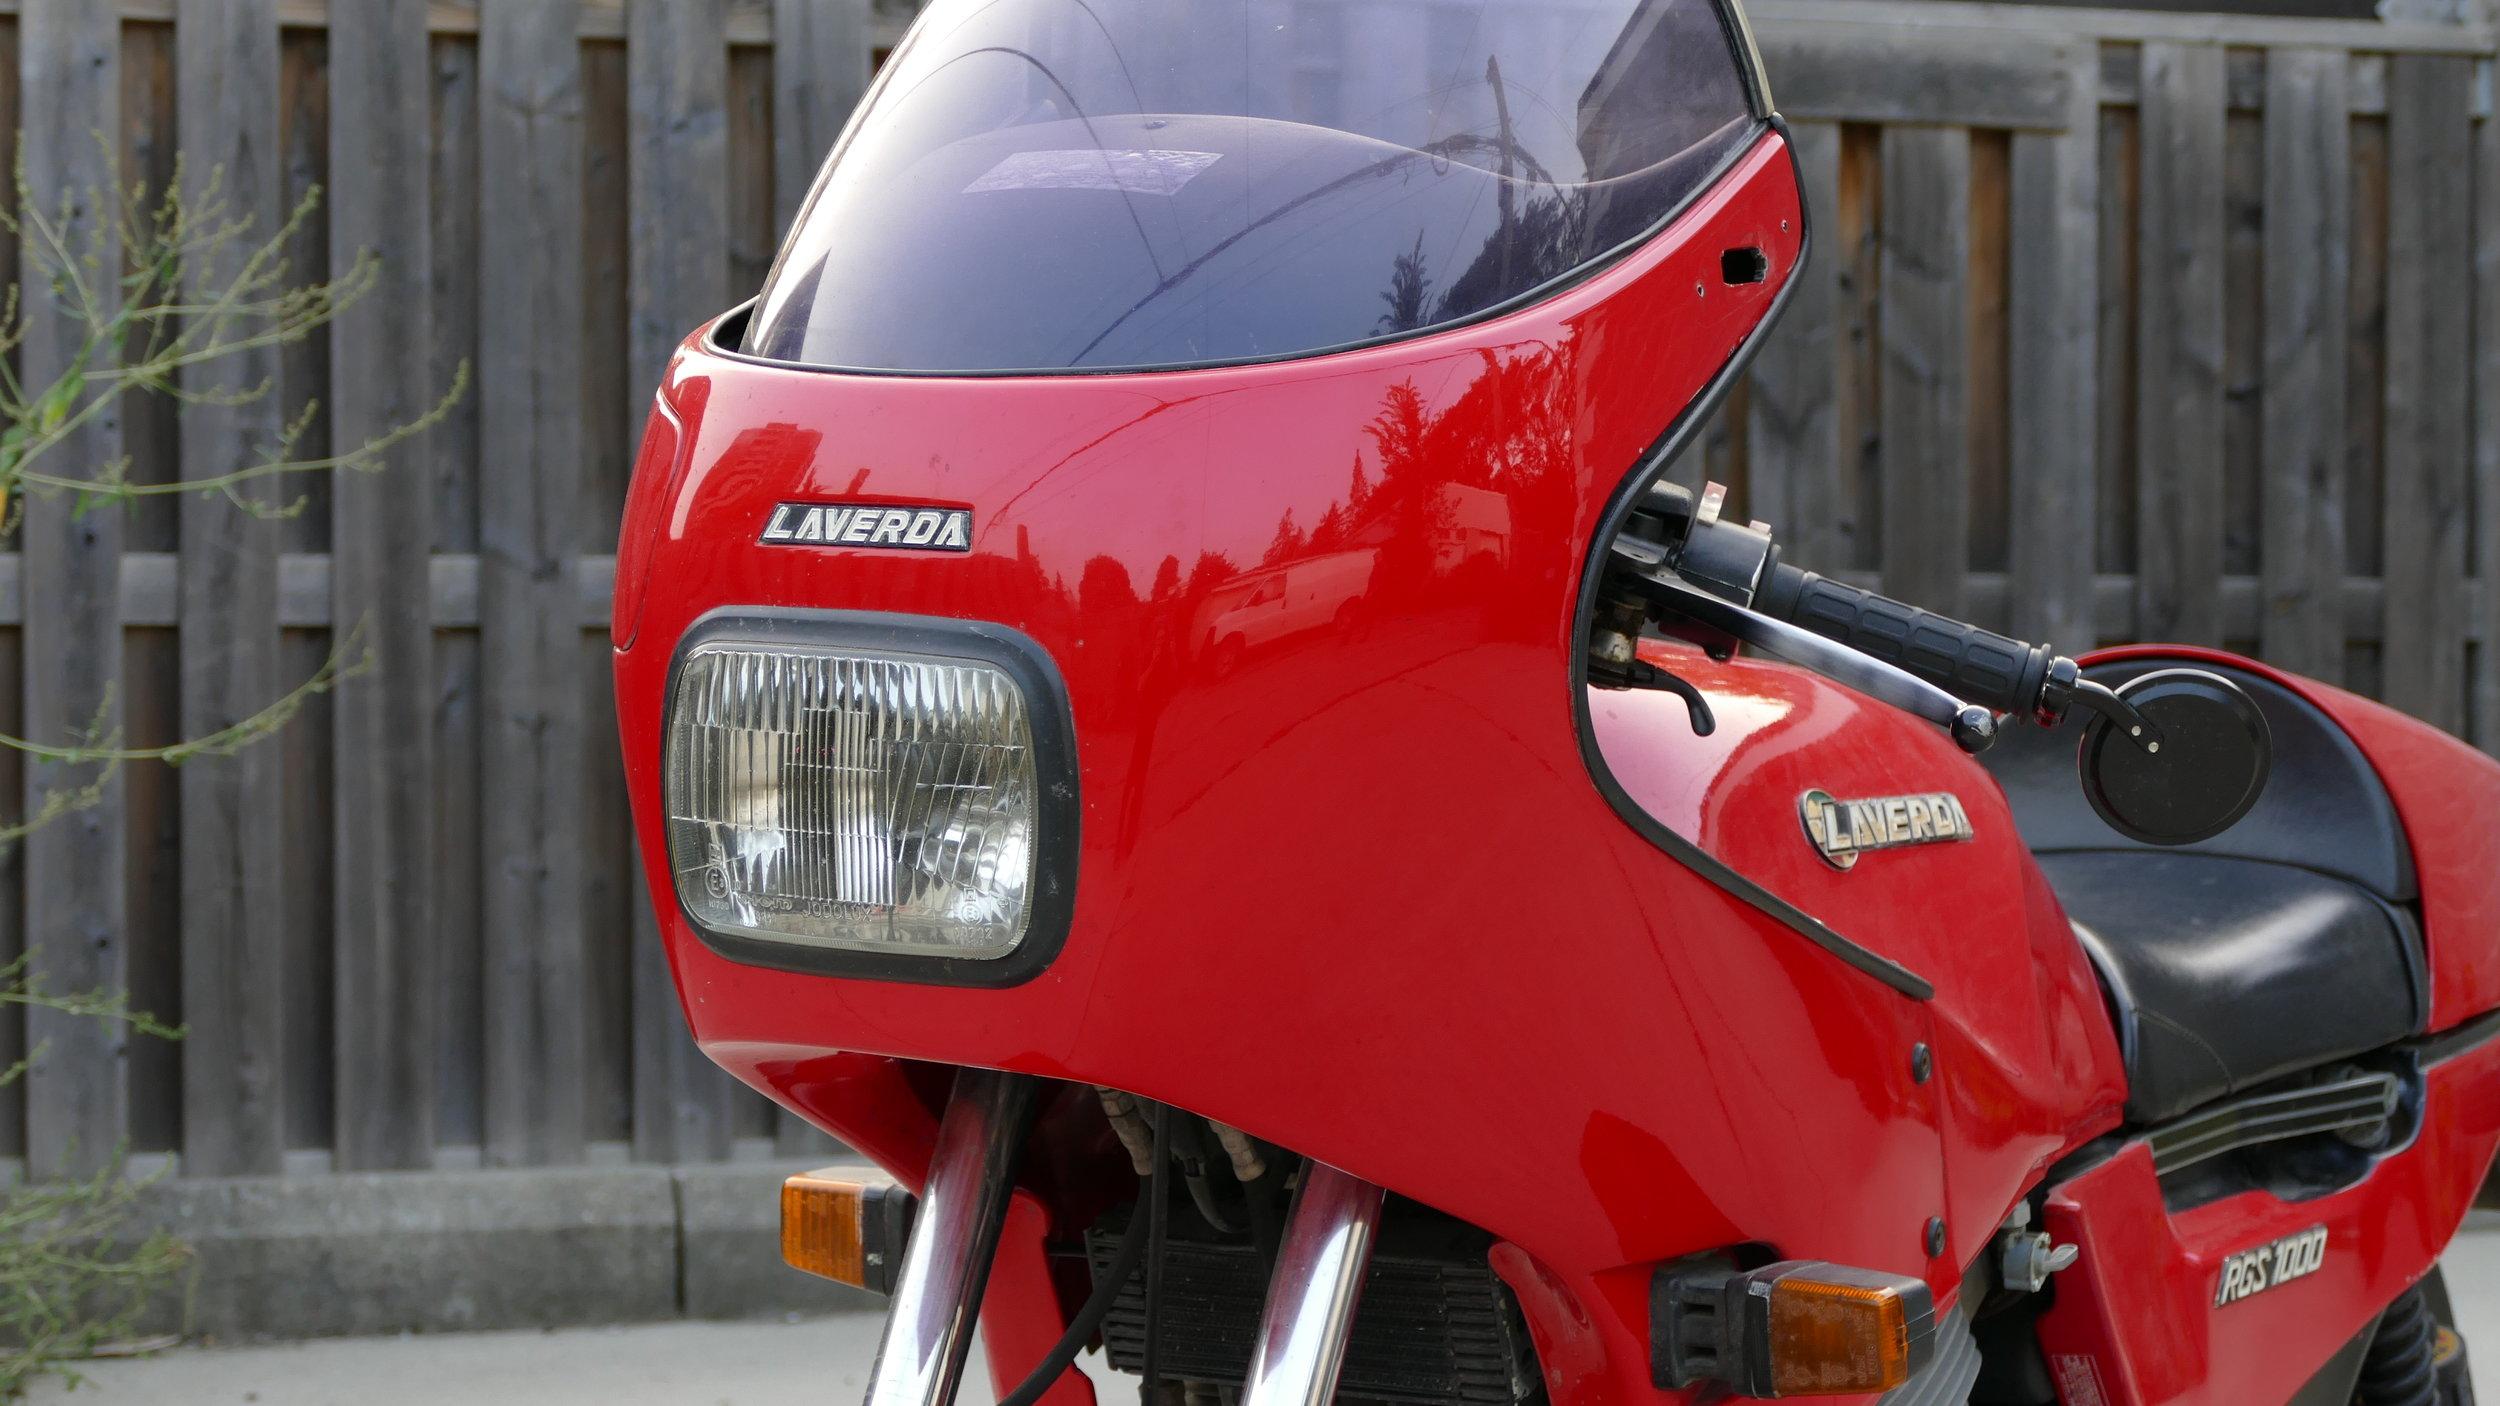 Laverda RGS 1000 -